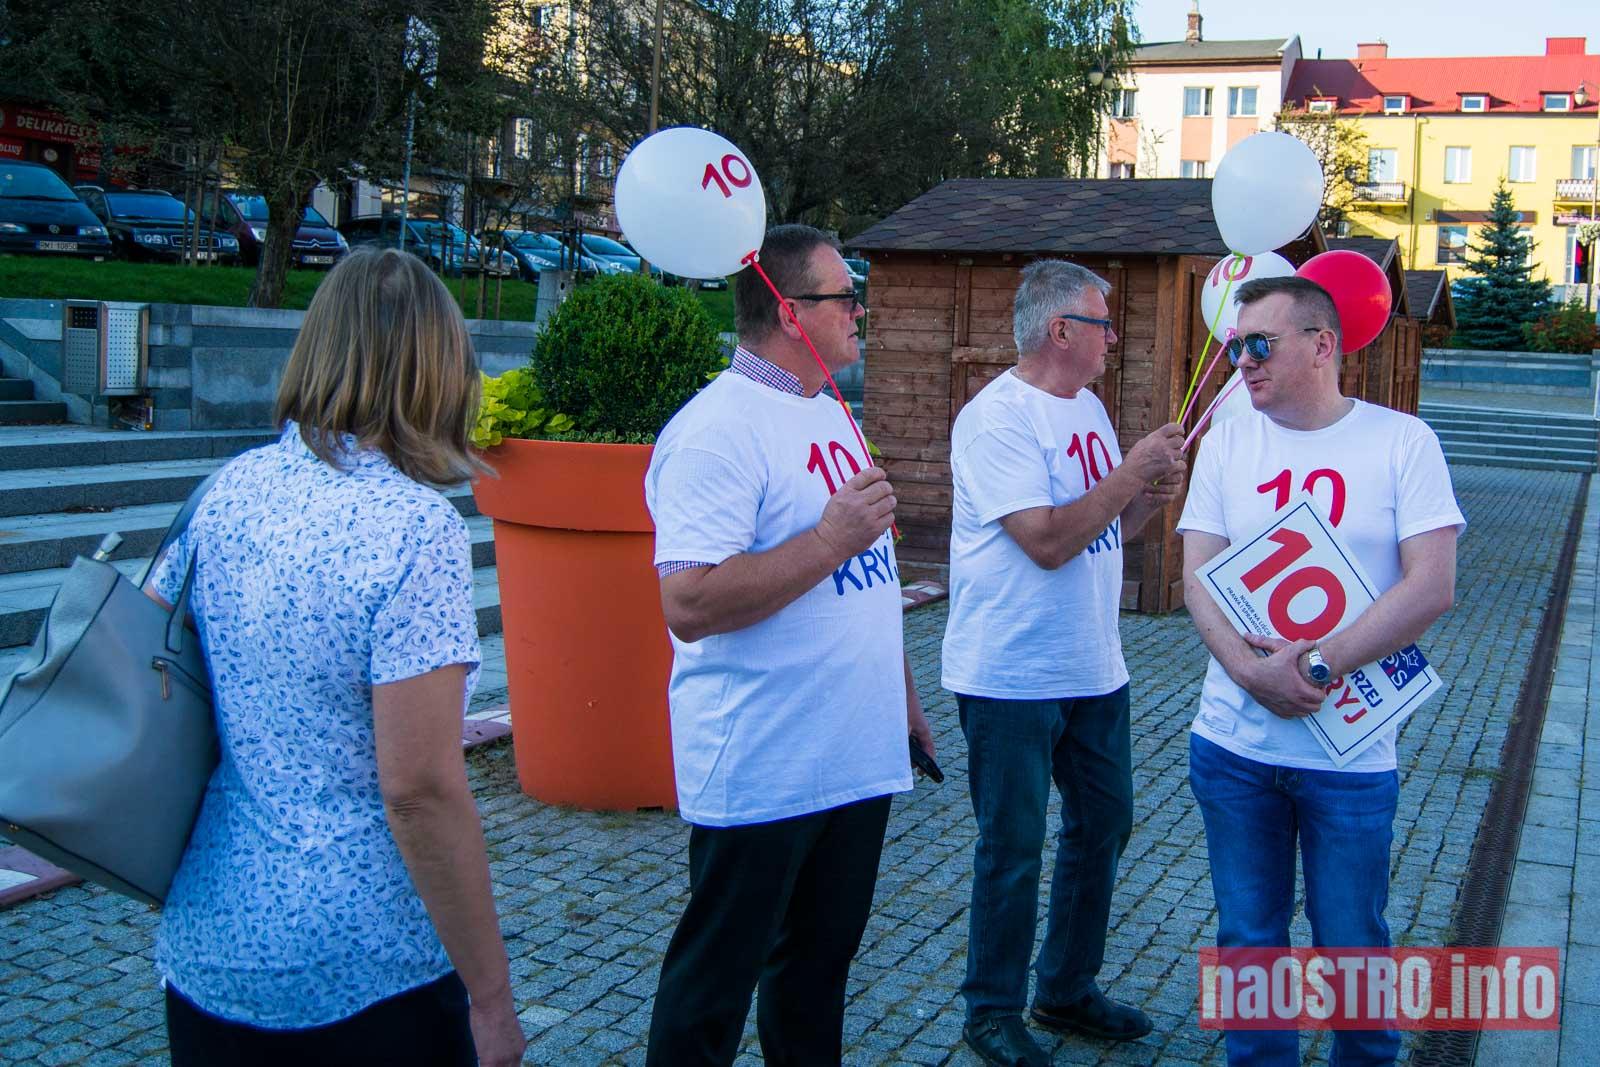 NaOSTRO Andrzej Kryj kampania-3